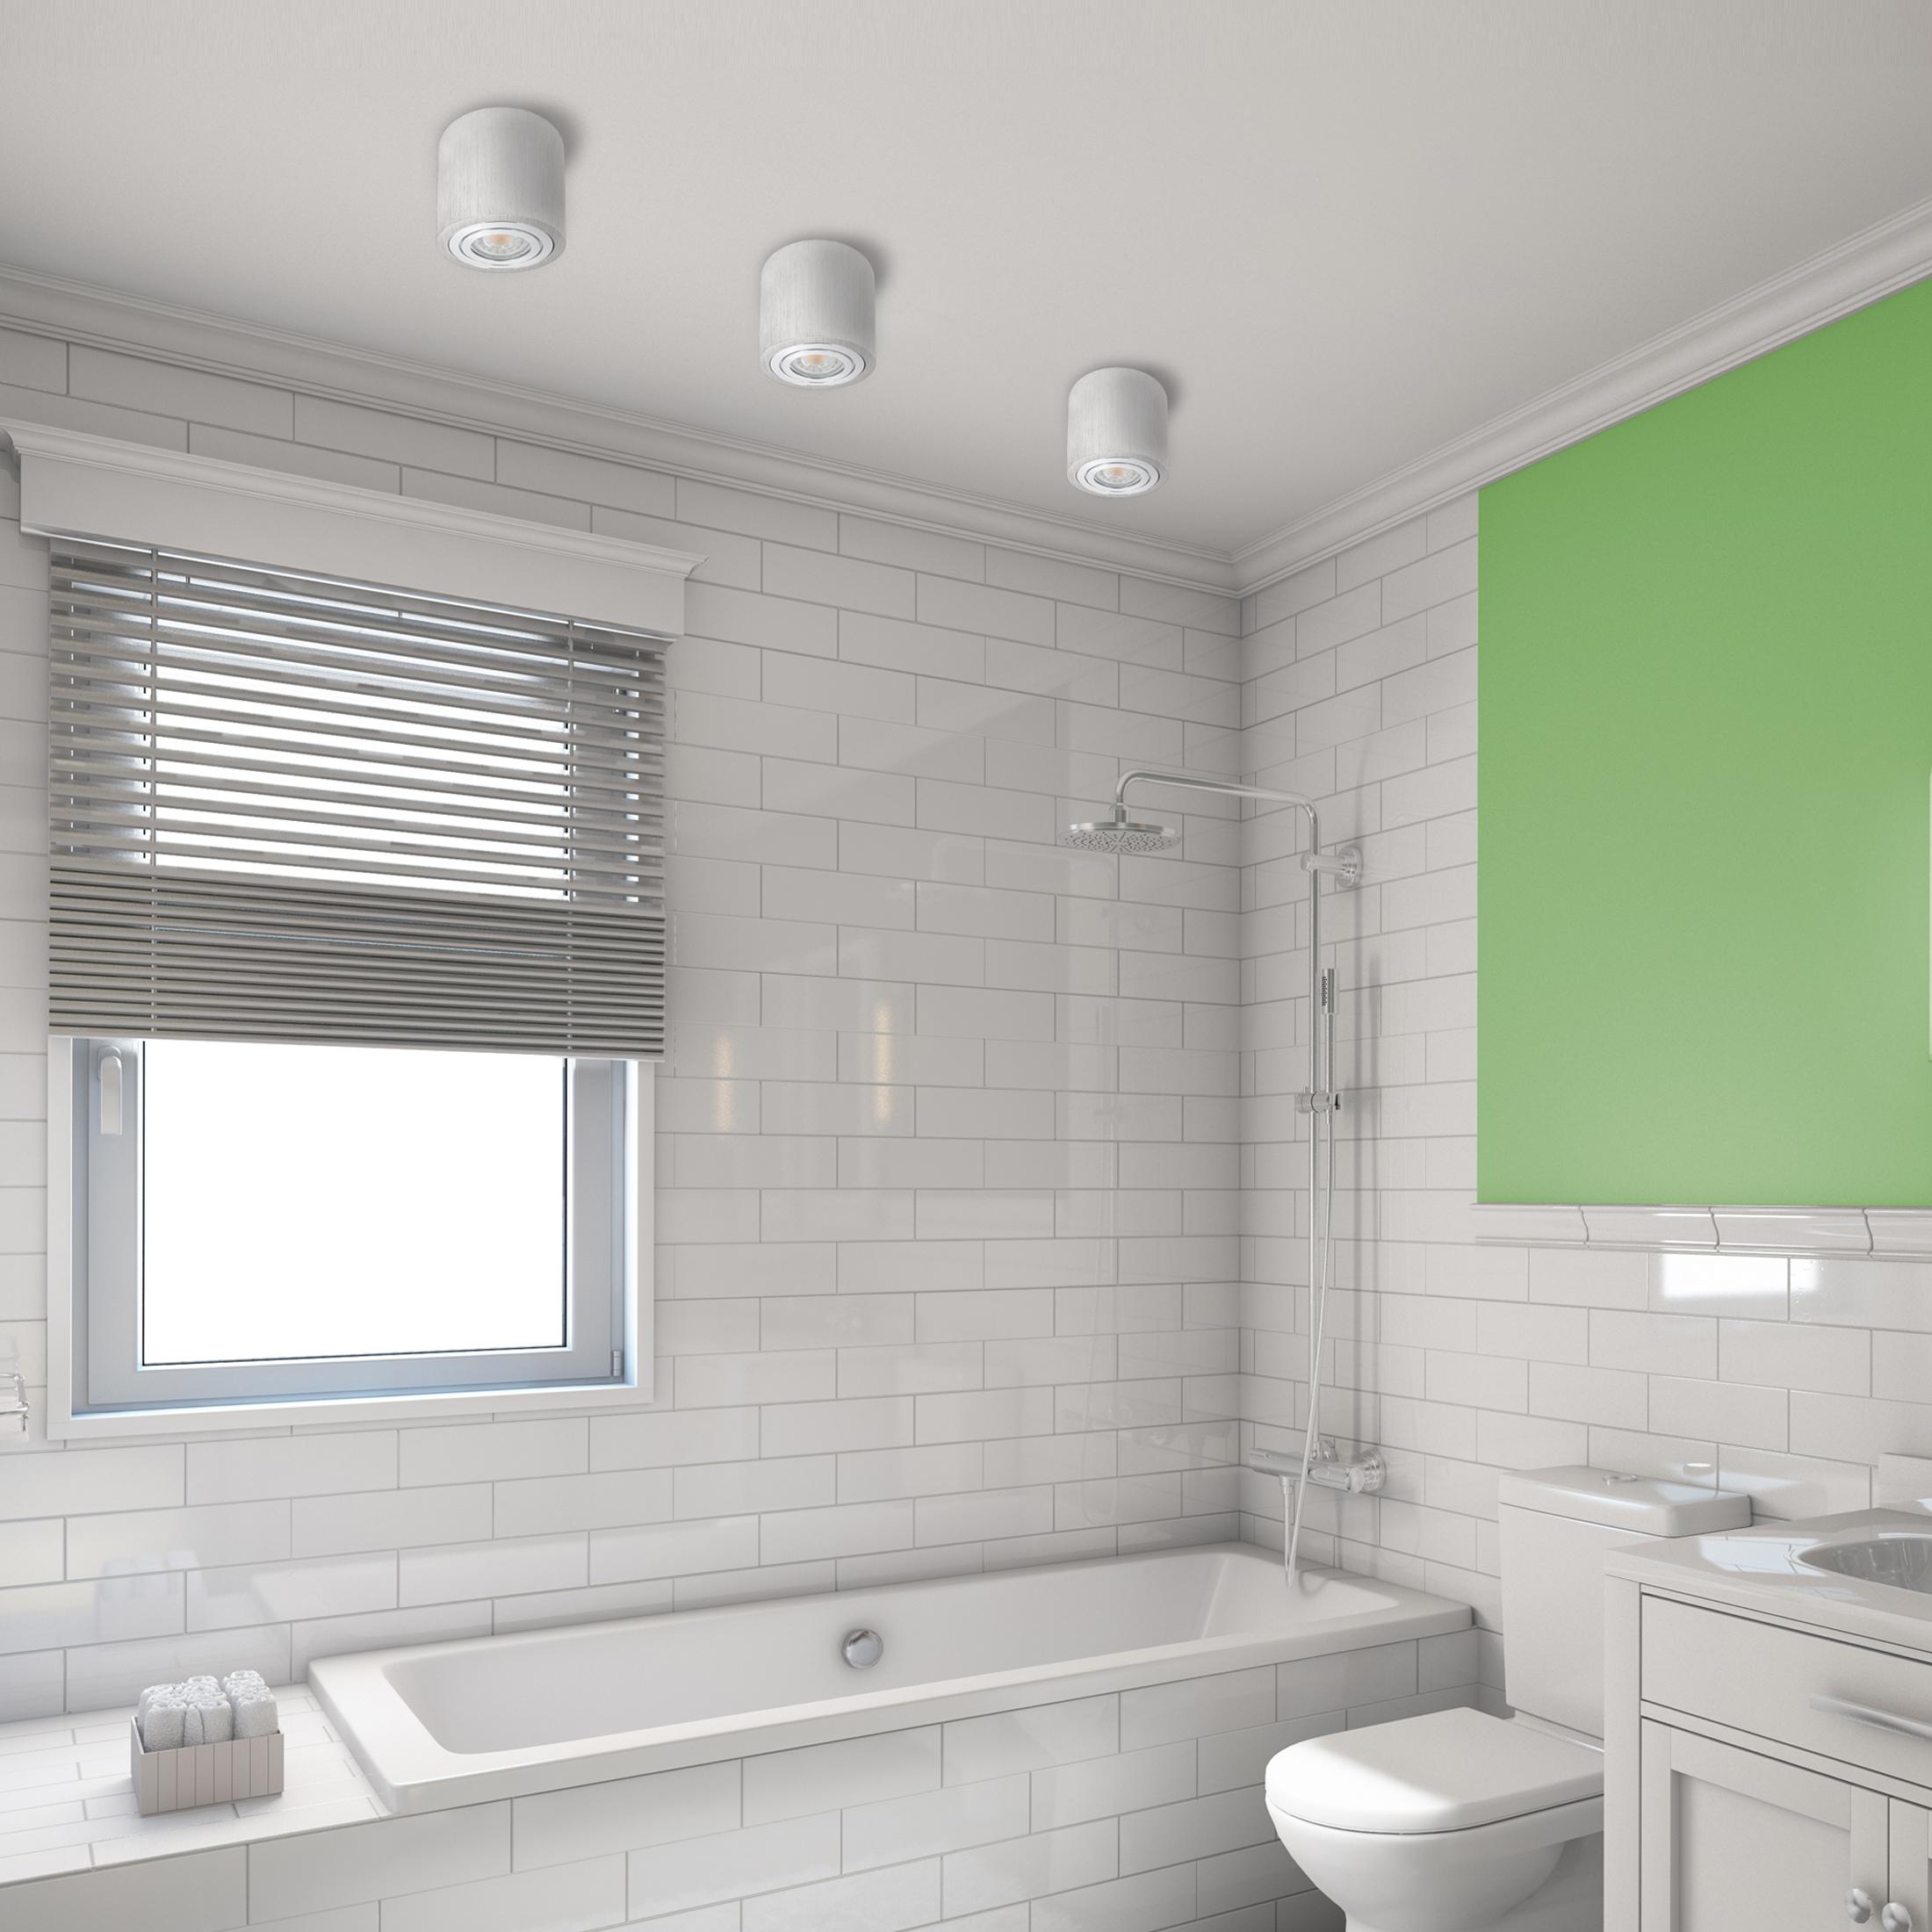 Feuchtraum Bad Aufbau Deckenspot Alu gebürstet IP11 inkl. LED 11W 21100K  warmweiß DIMMBAR